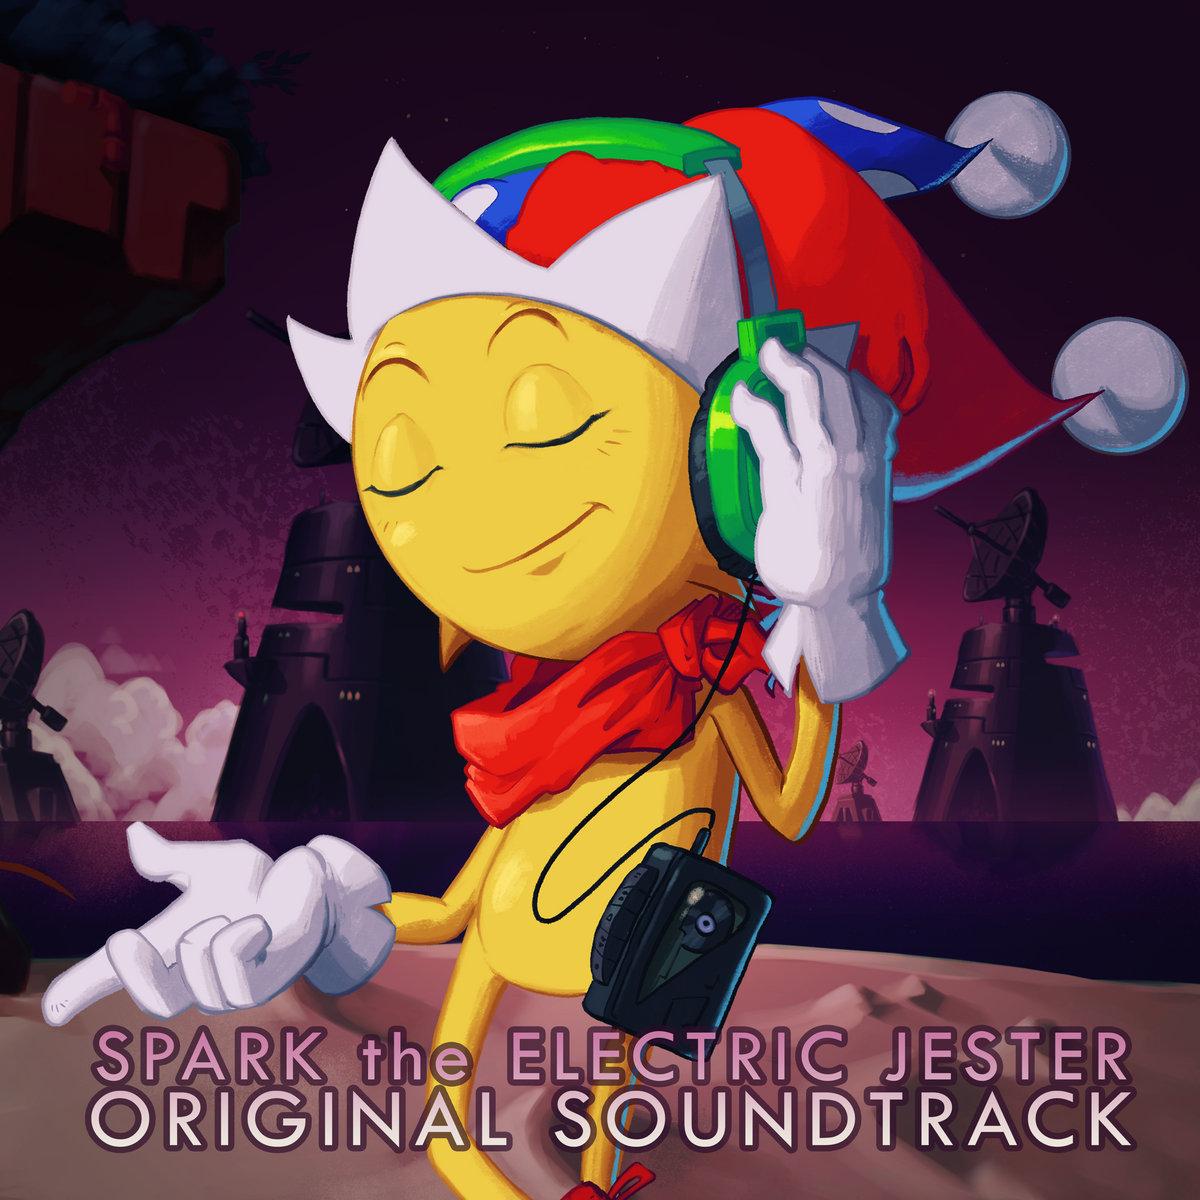 Kuvahaun tulos haulle spark the electric jester listening to music